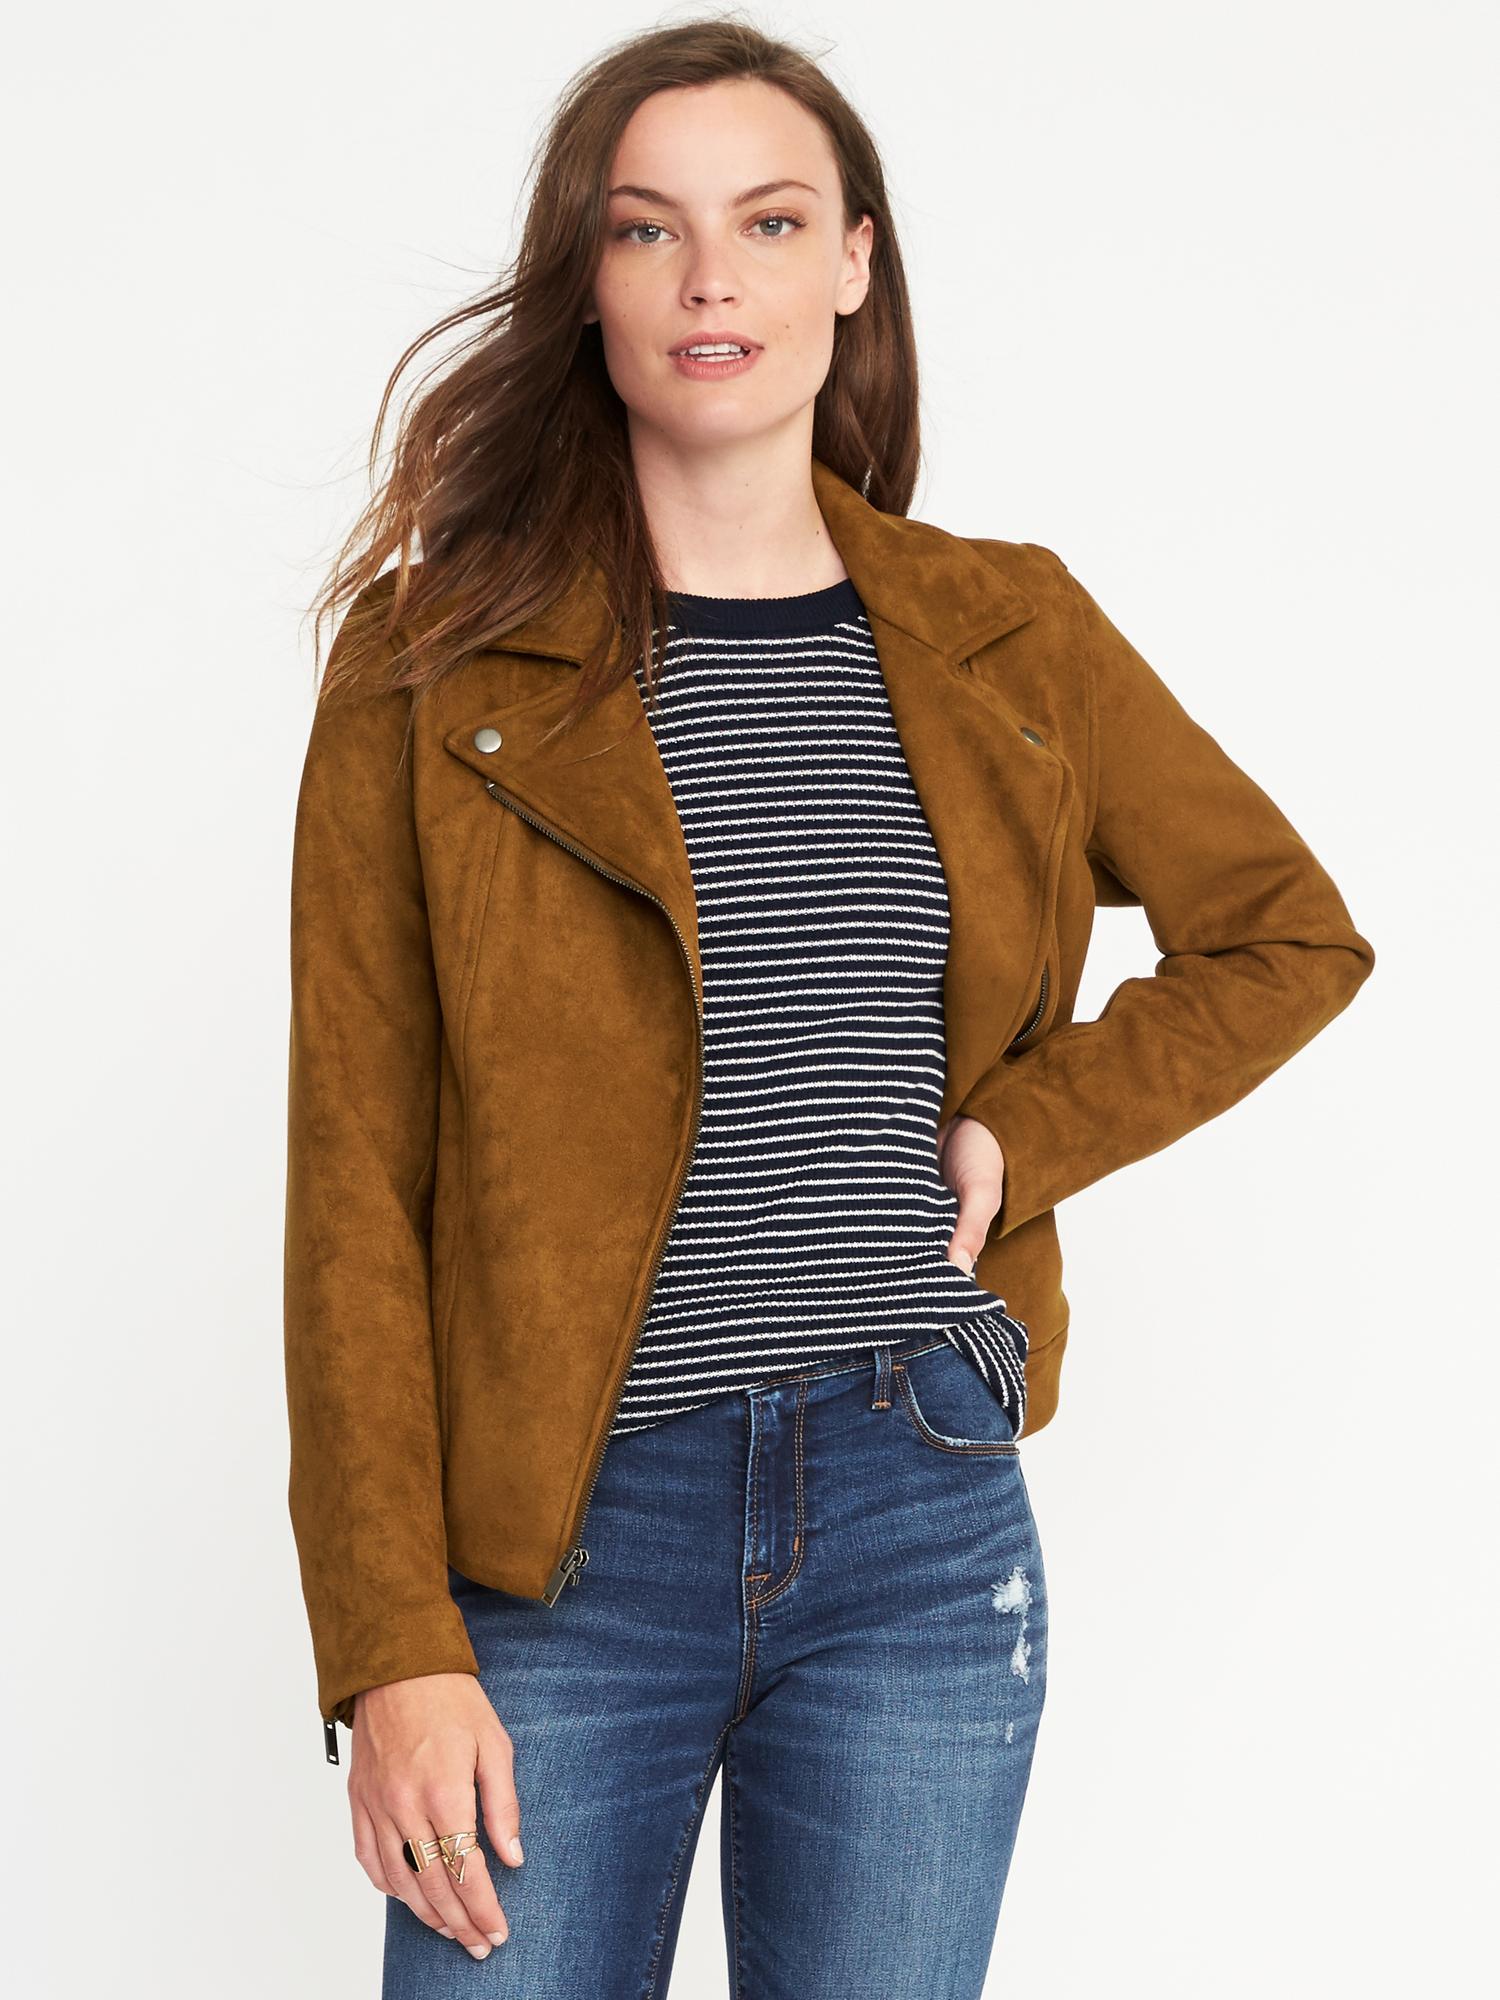 dba5696eb24 Sueded-Knit Moto Jacket for Women